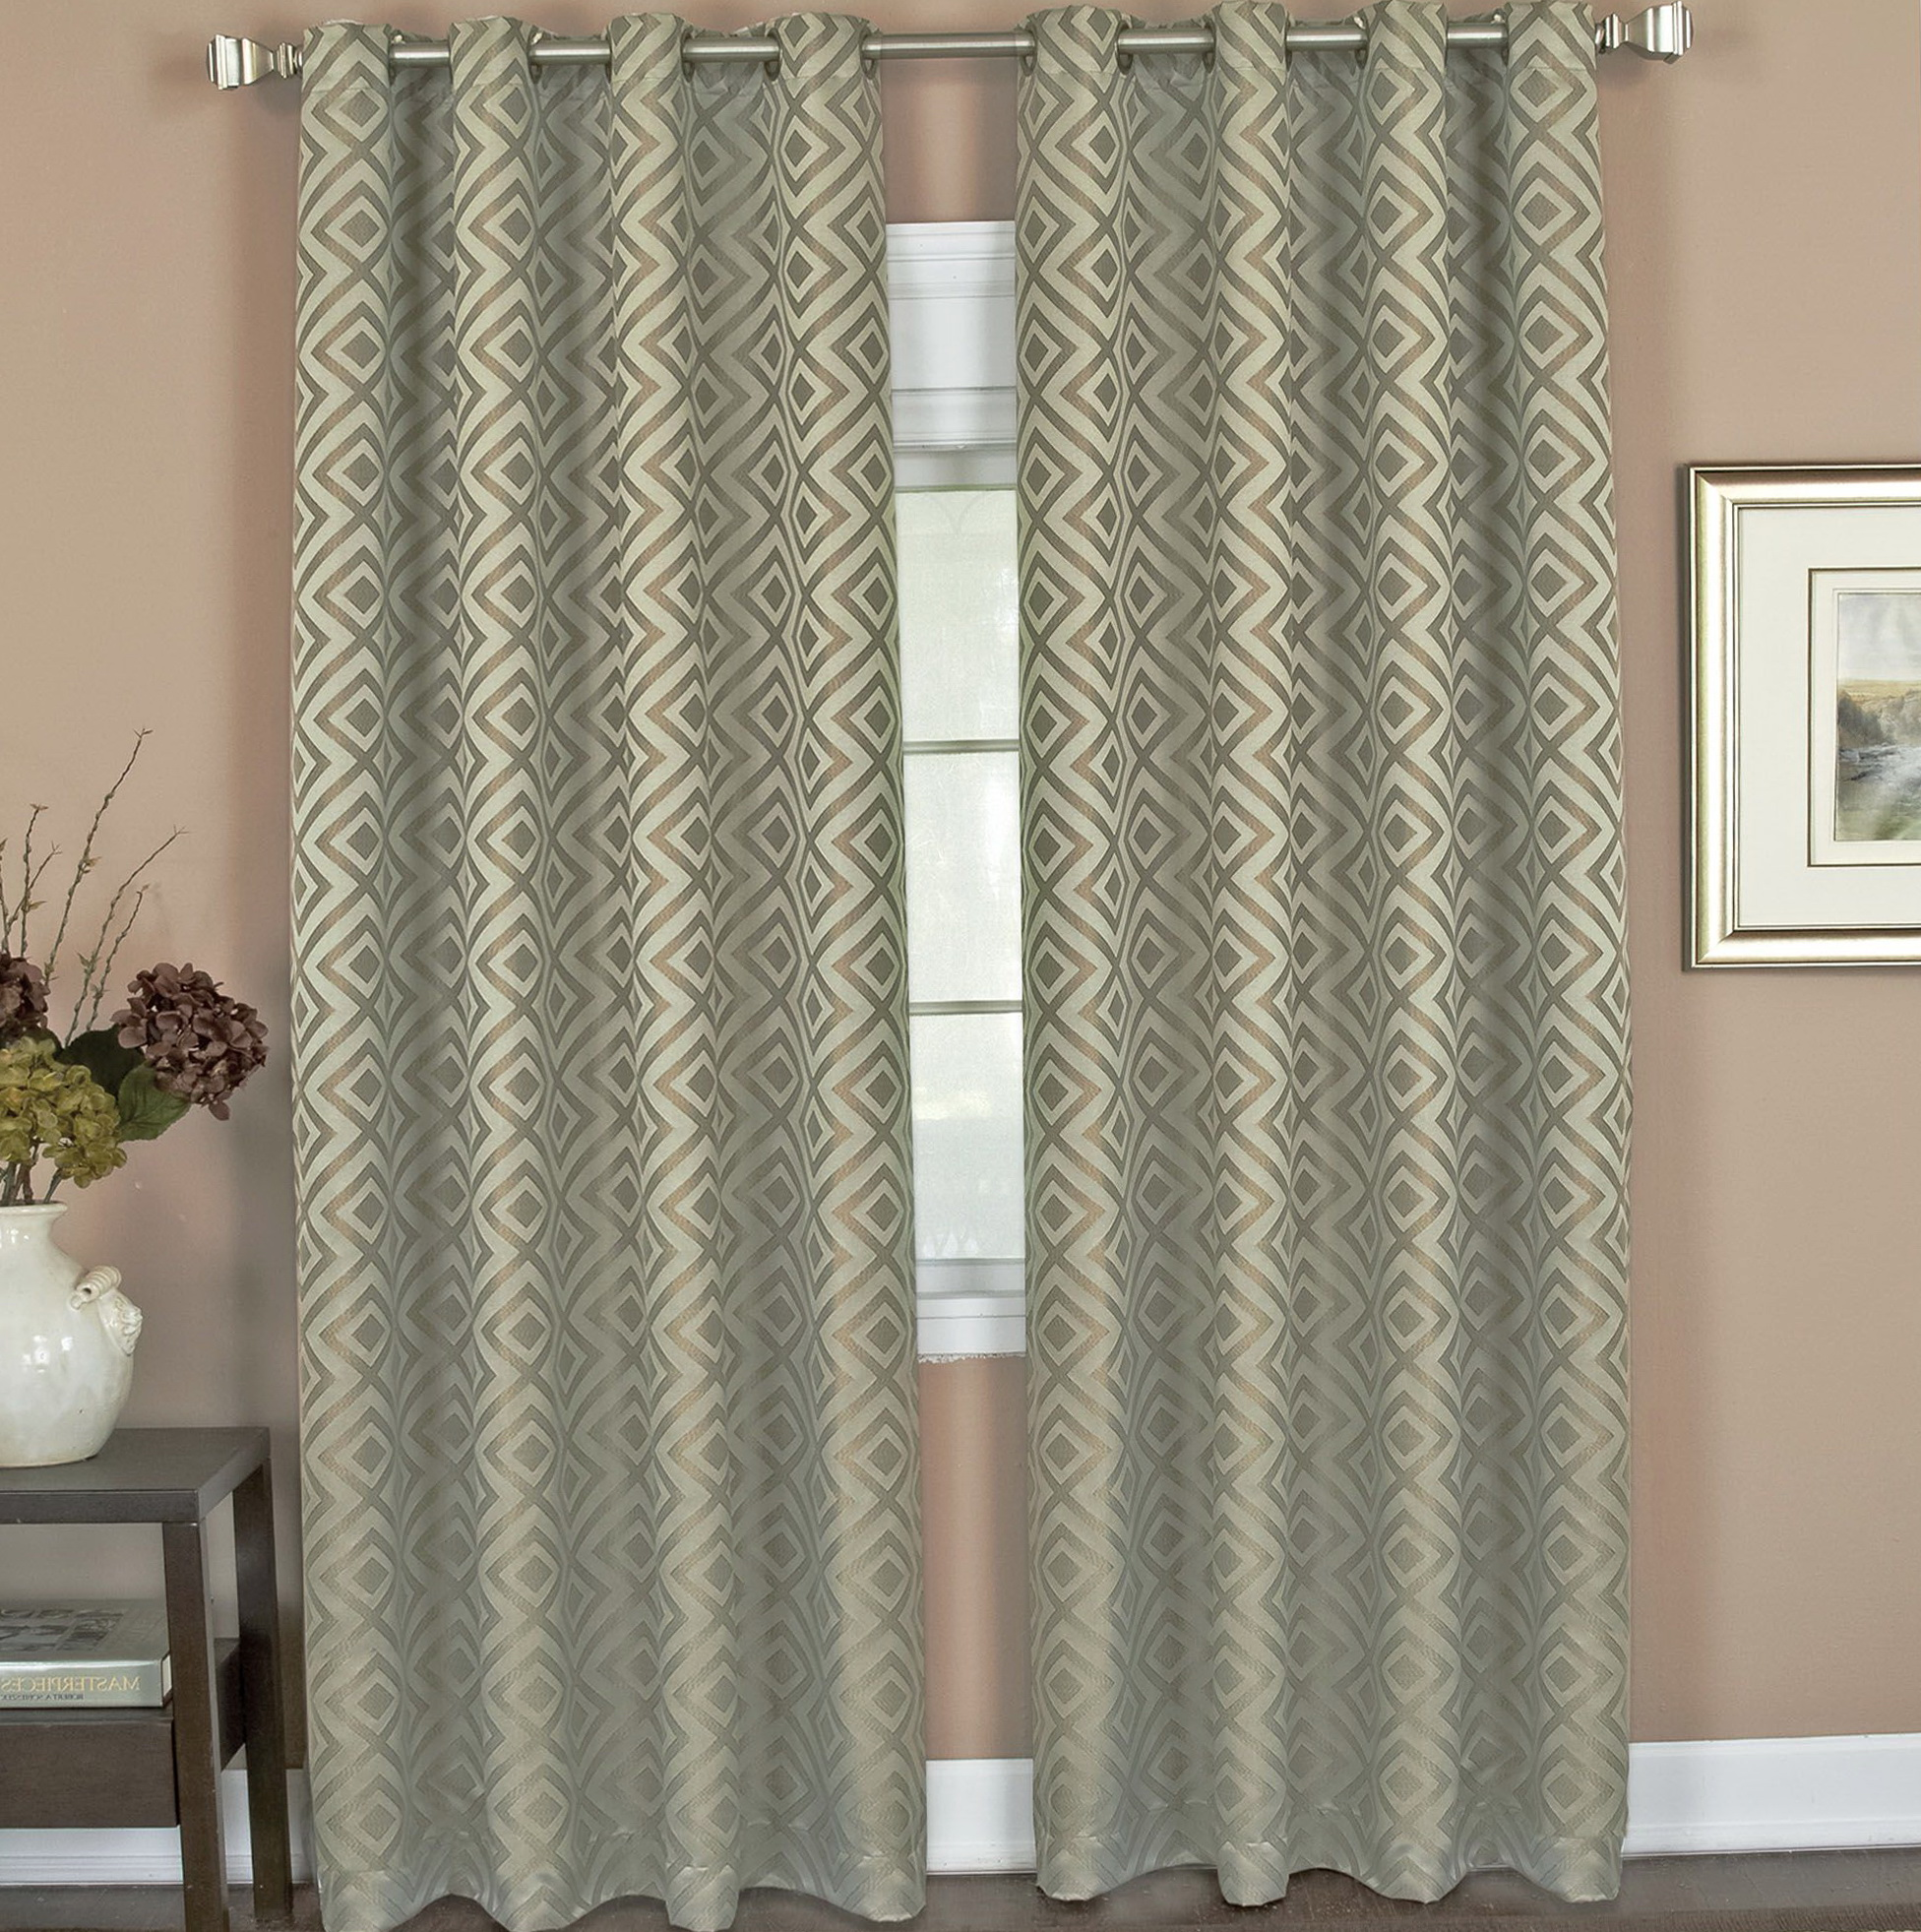 Curtain Rods For Grommet Panels